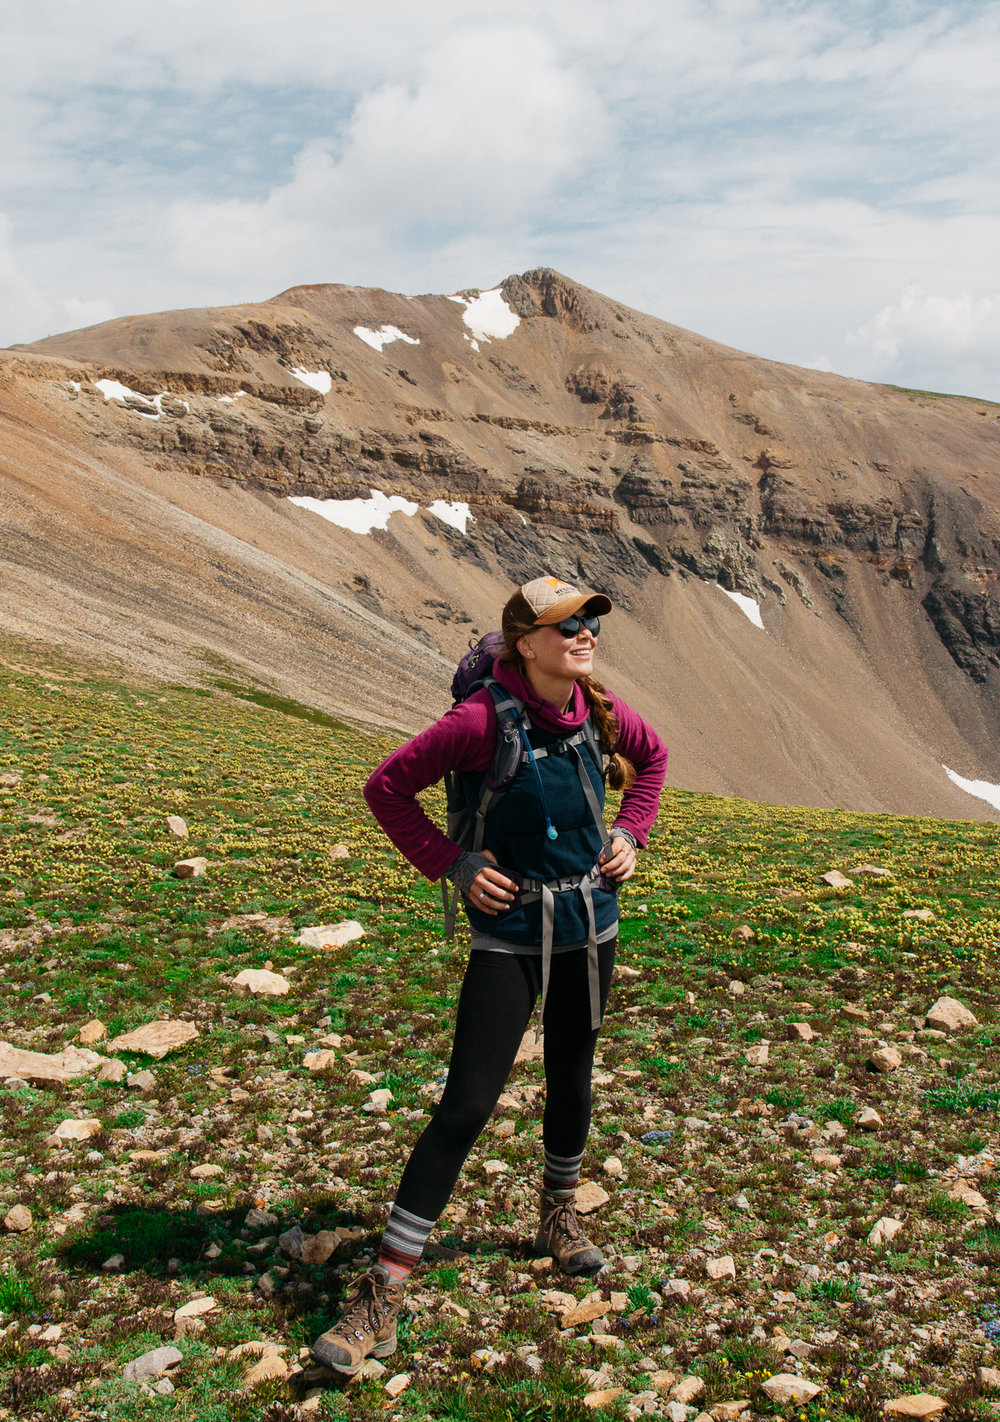 Colorado_14ers__Canon_July17_36.jpg